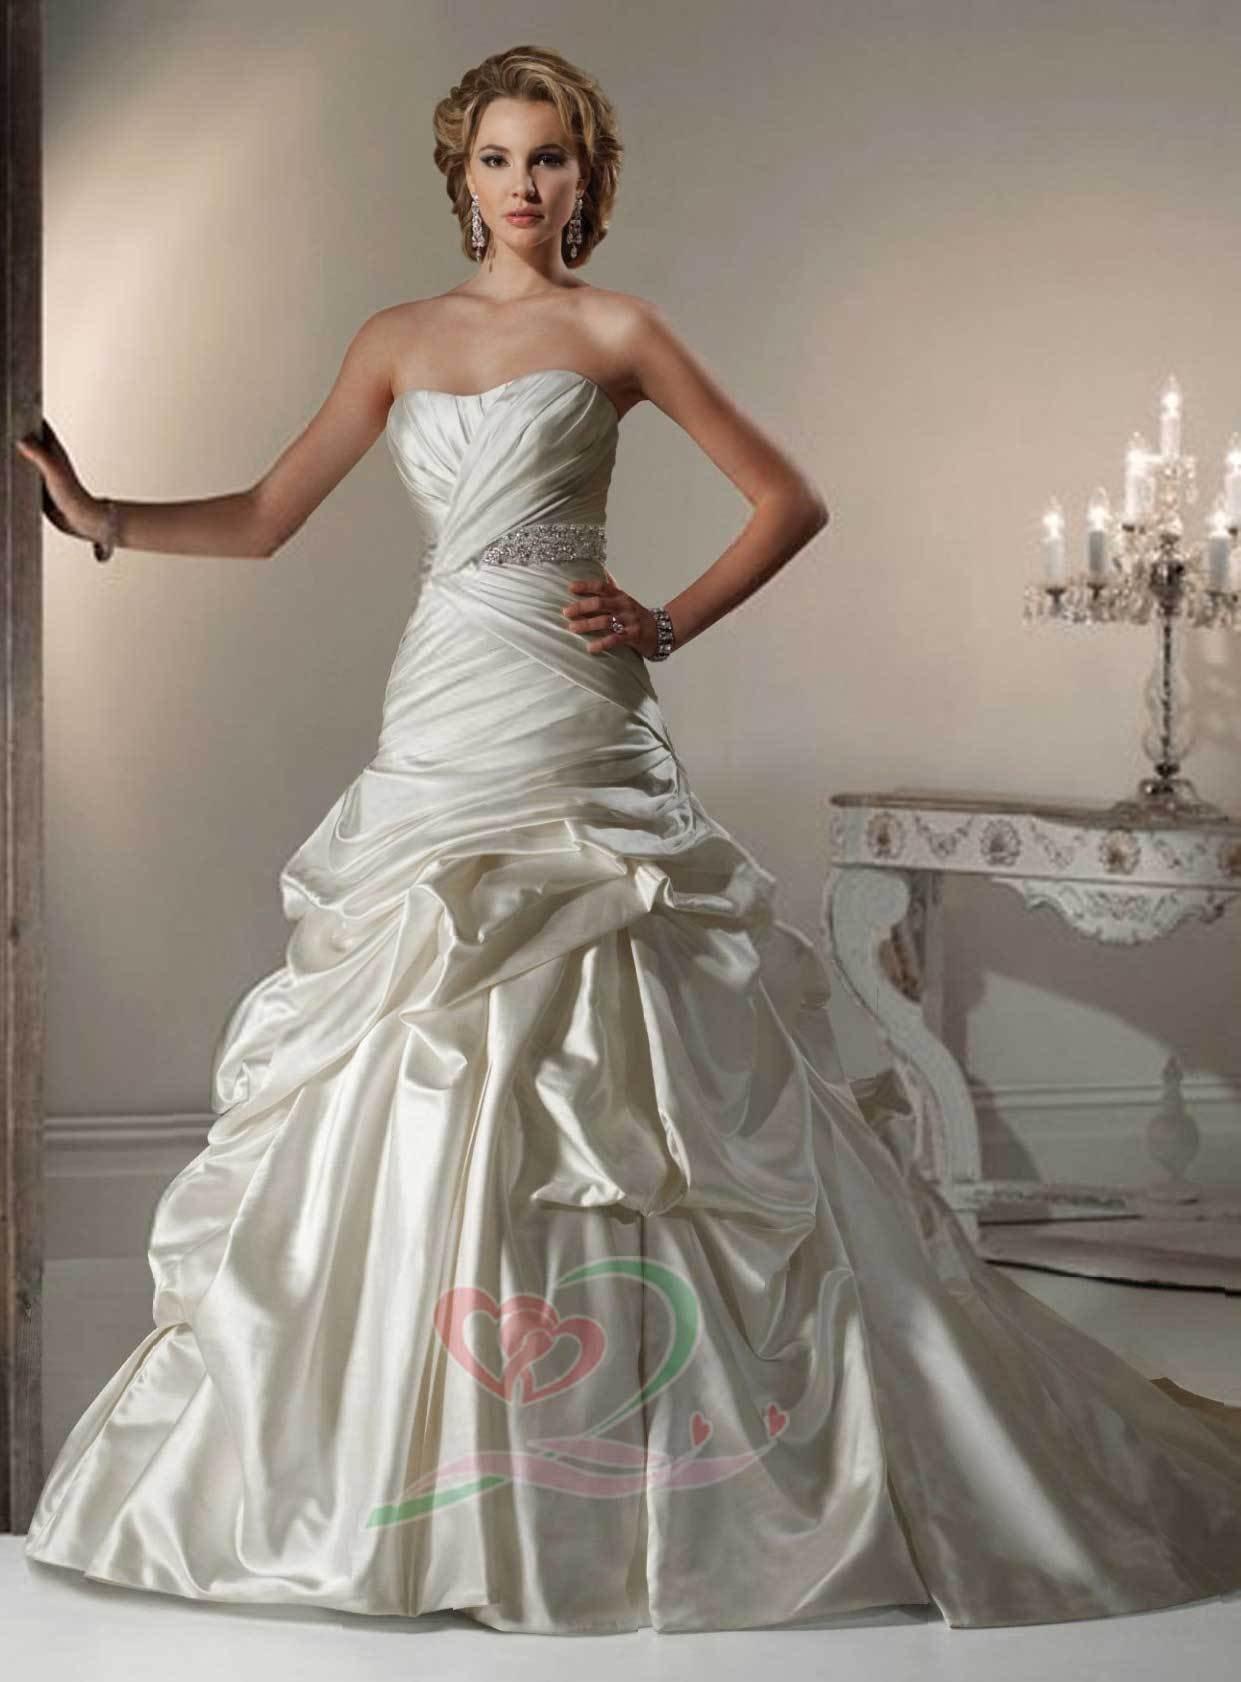 fashion wedding dresses | Wedding dresses 2013